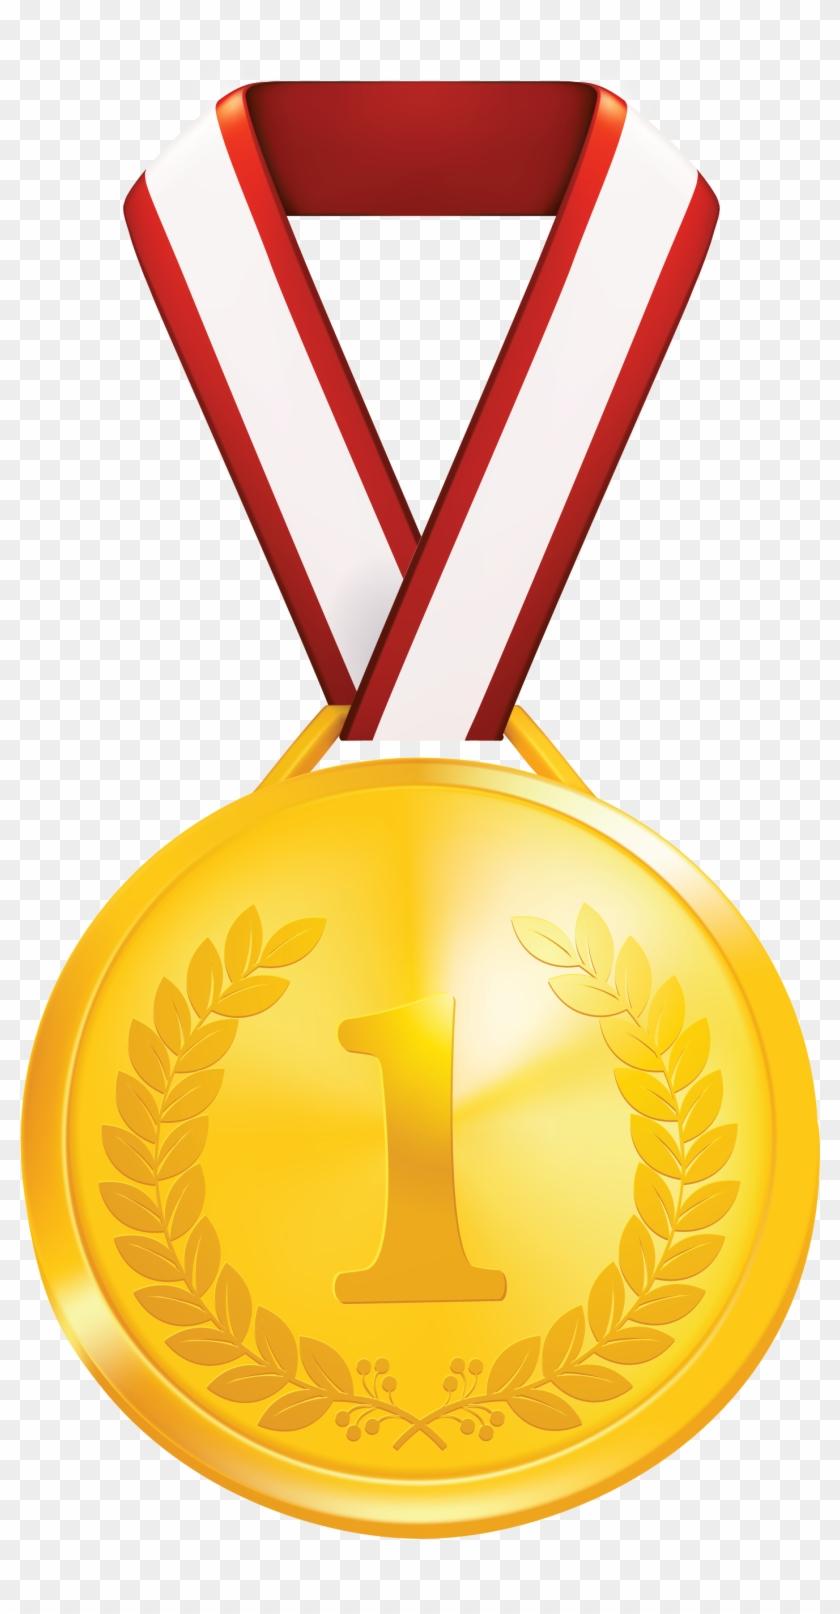 Gold Medal Laurel Wreath Clip Art - Clip Art Gold Medal #195143